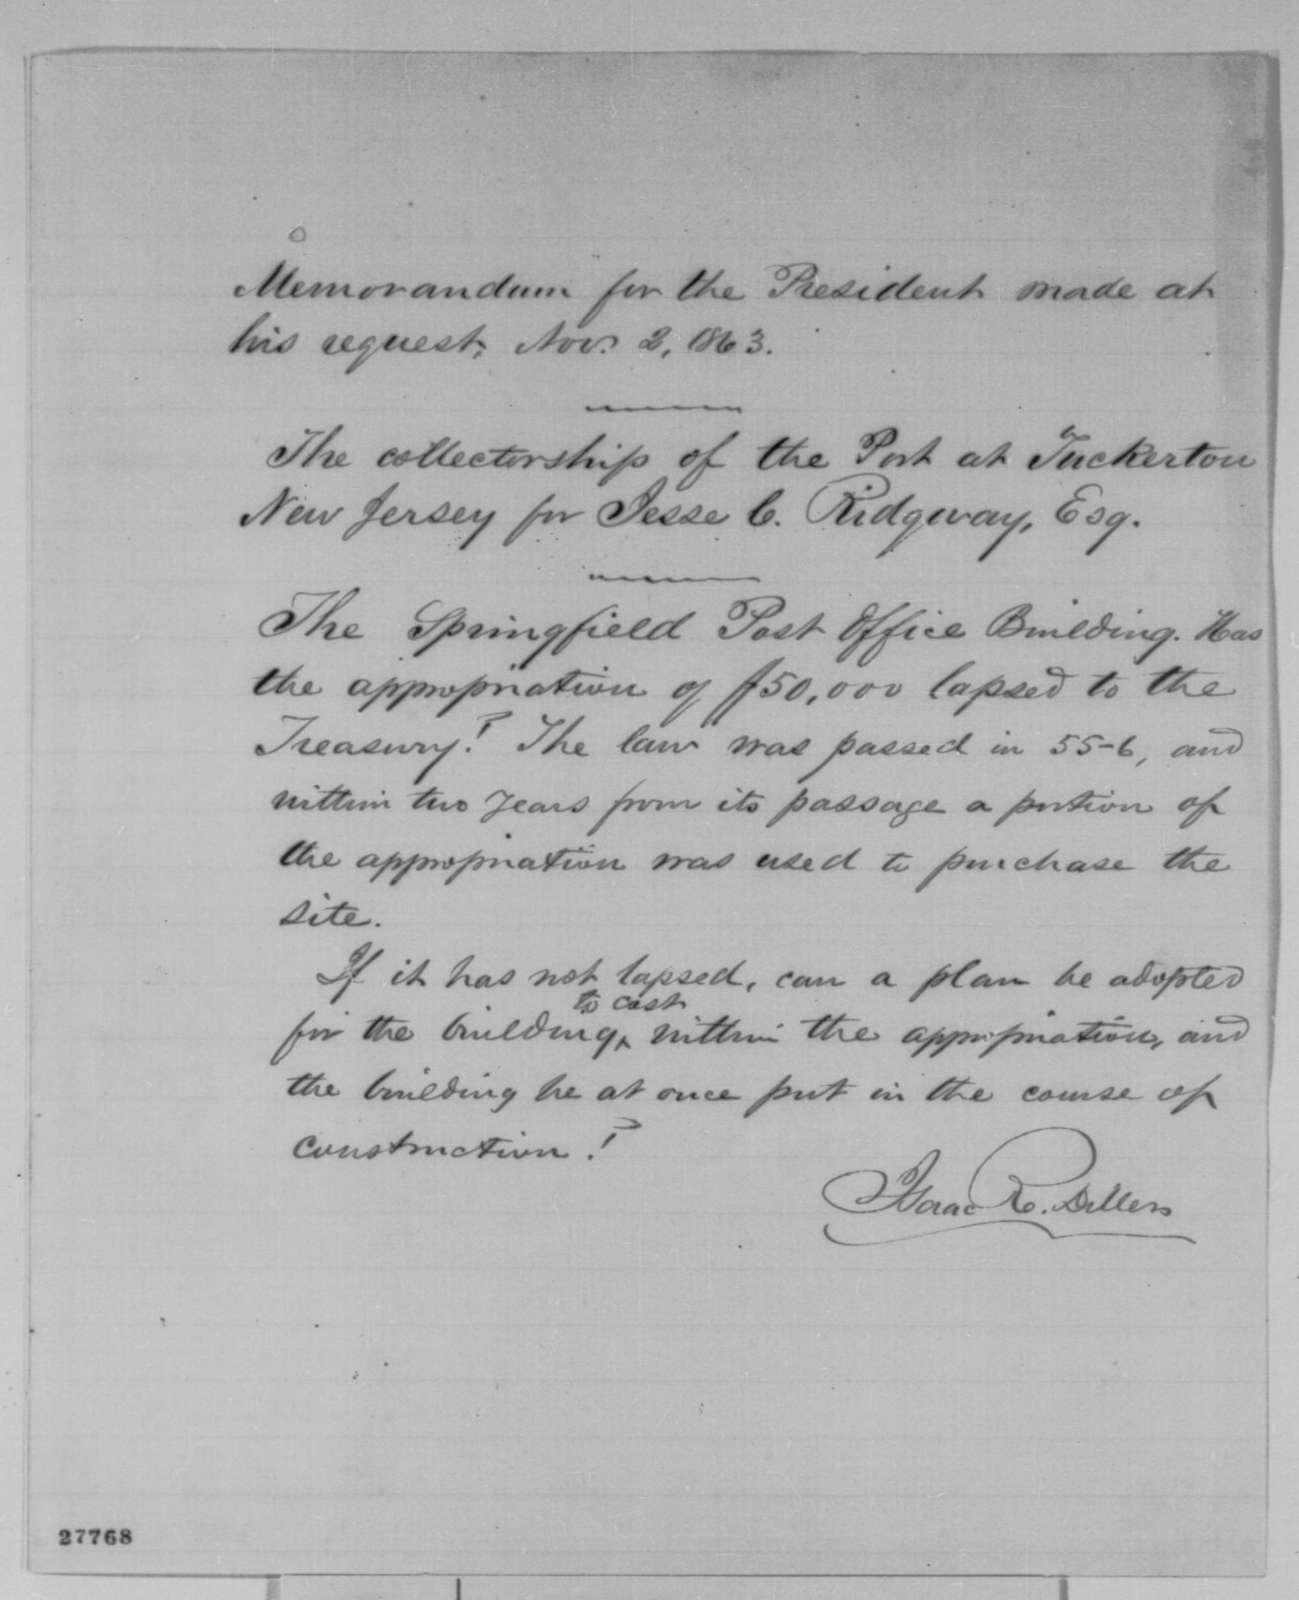 Isaac R. Diller to Abraham Lincoln, Monday, November 02, 1863  (Memorandum on Springfield post office building)